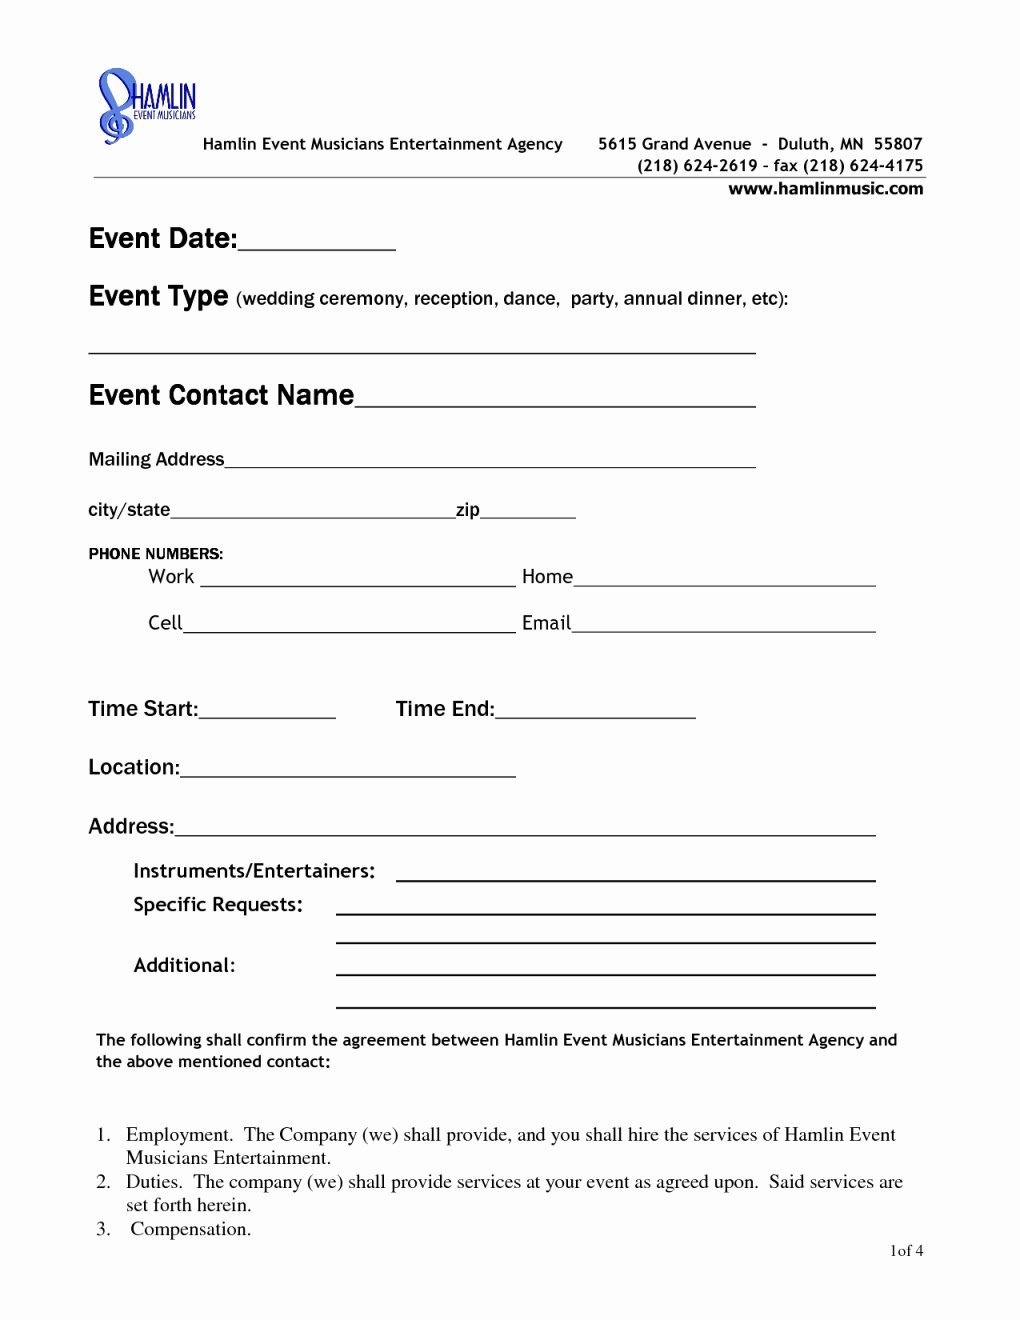 Venue Rental Agreement Template Luxury Free event Rental Agreement Template